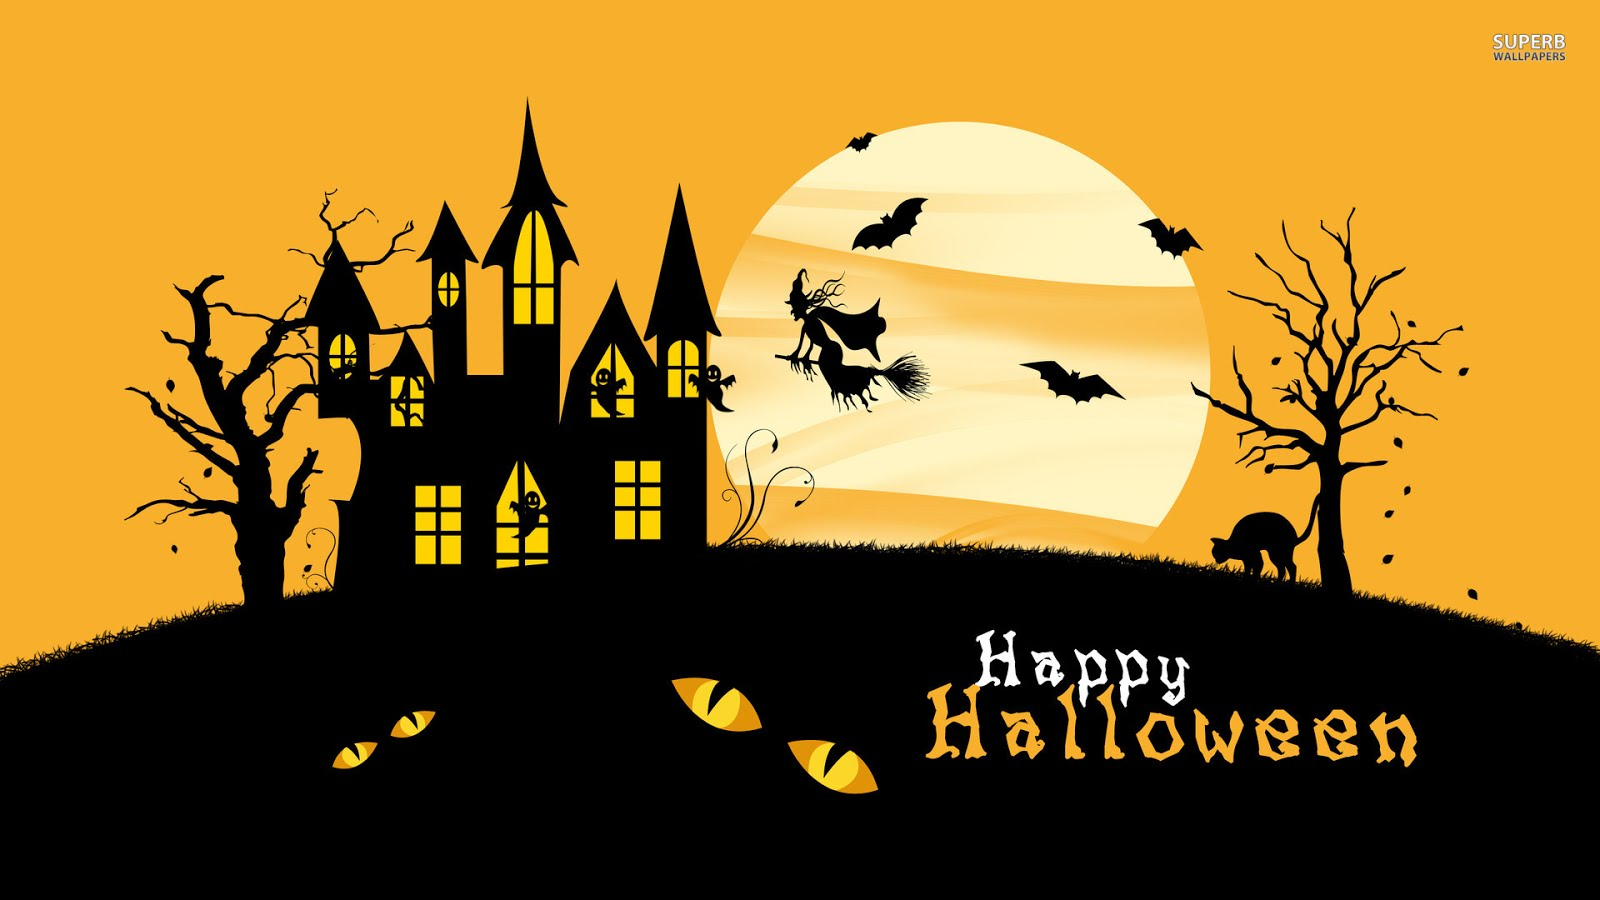 Happy Halloween Pictures Free Download